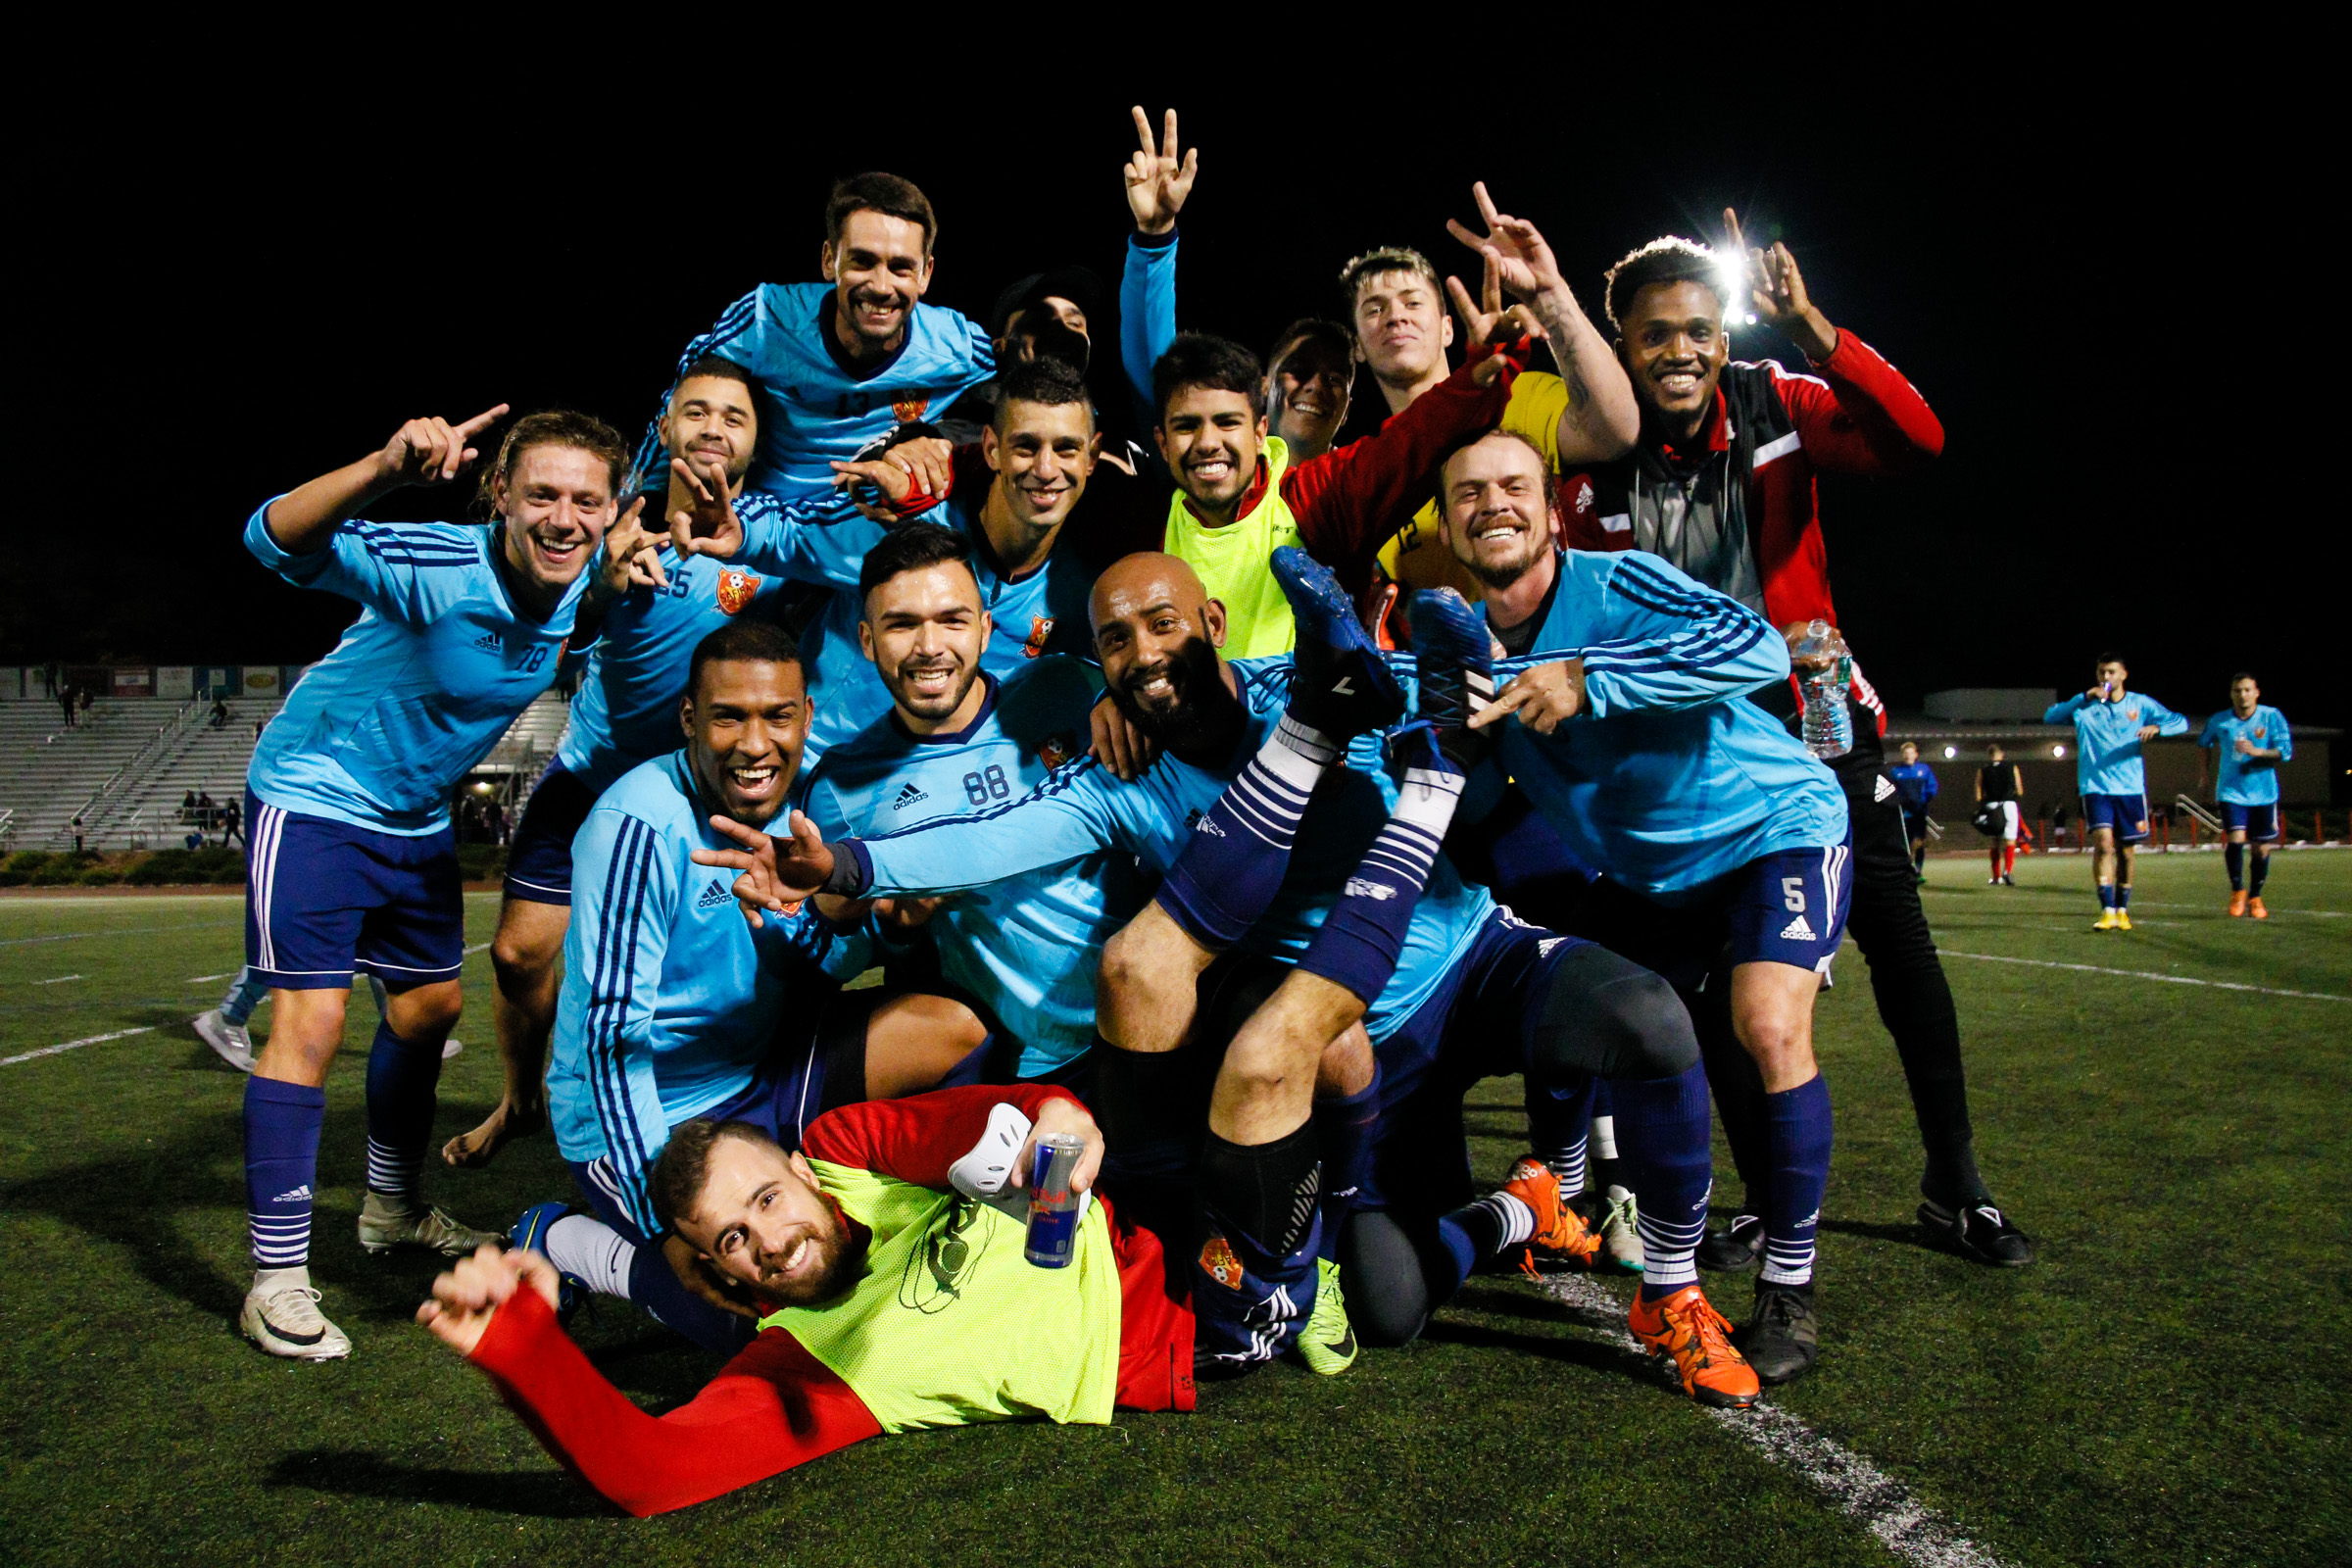 Somerville, MA: Safira FC defeated Boston City FC 4-1 in a 2019 Lamar Hunt U.S. Open Cup game on October 20, 2018. (c) Burt Granofsky